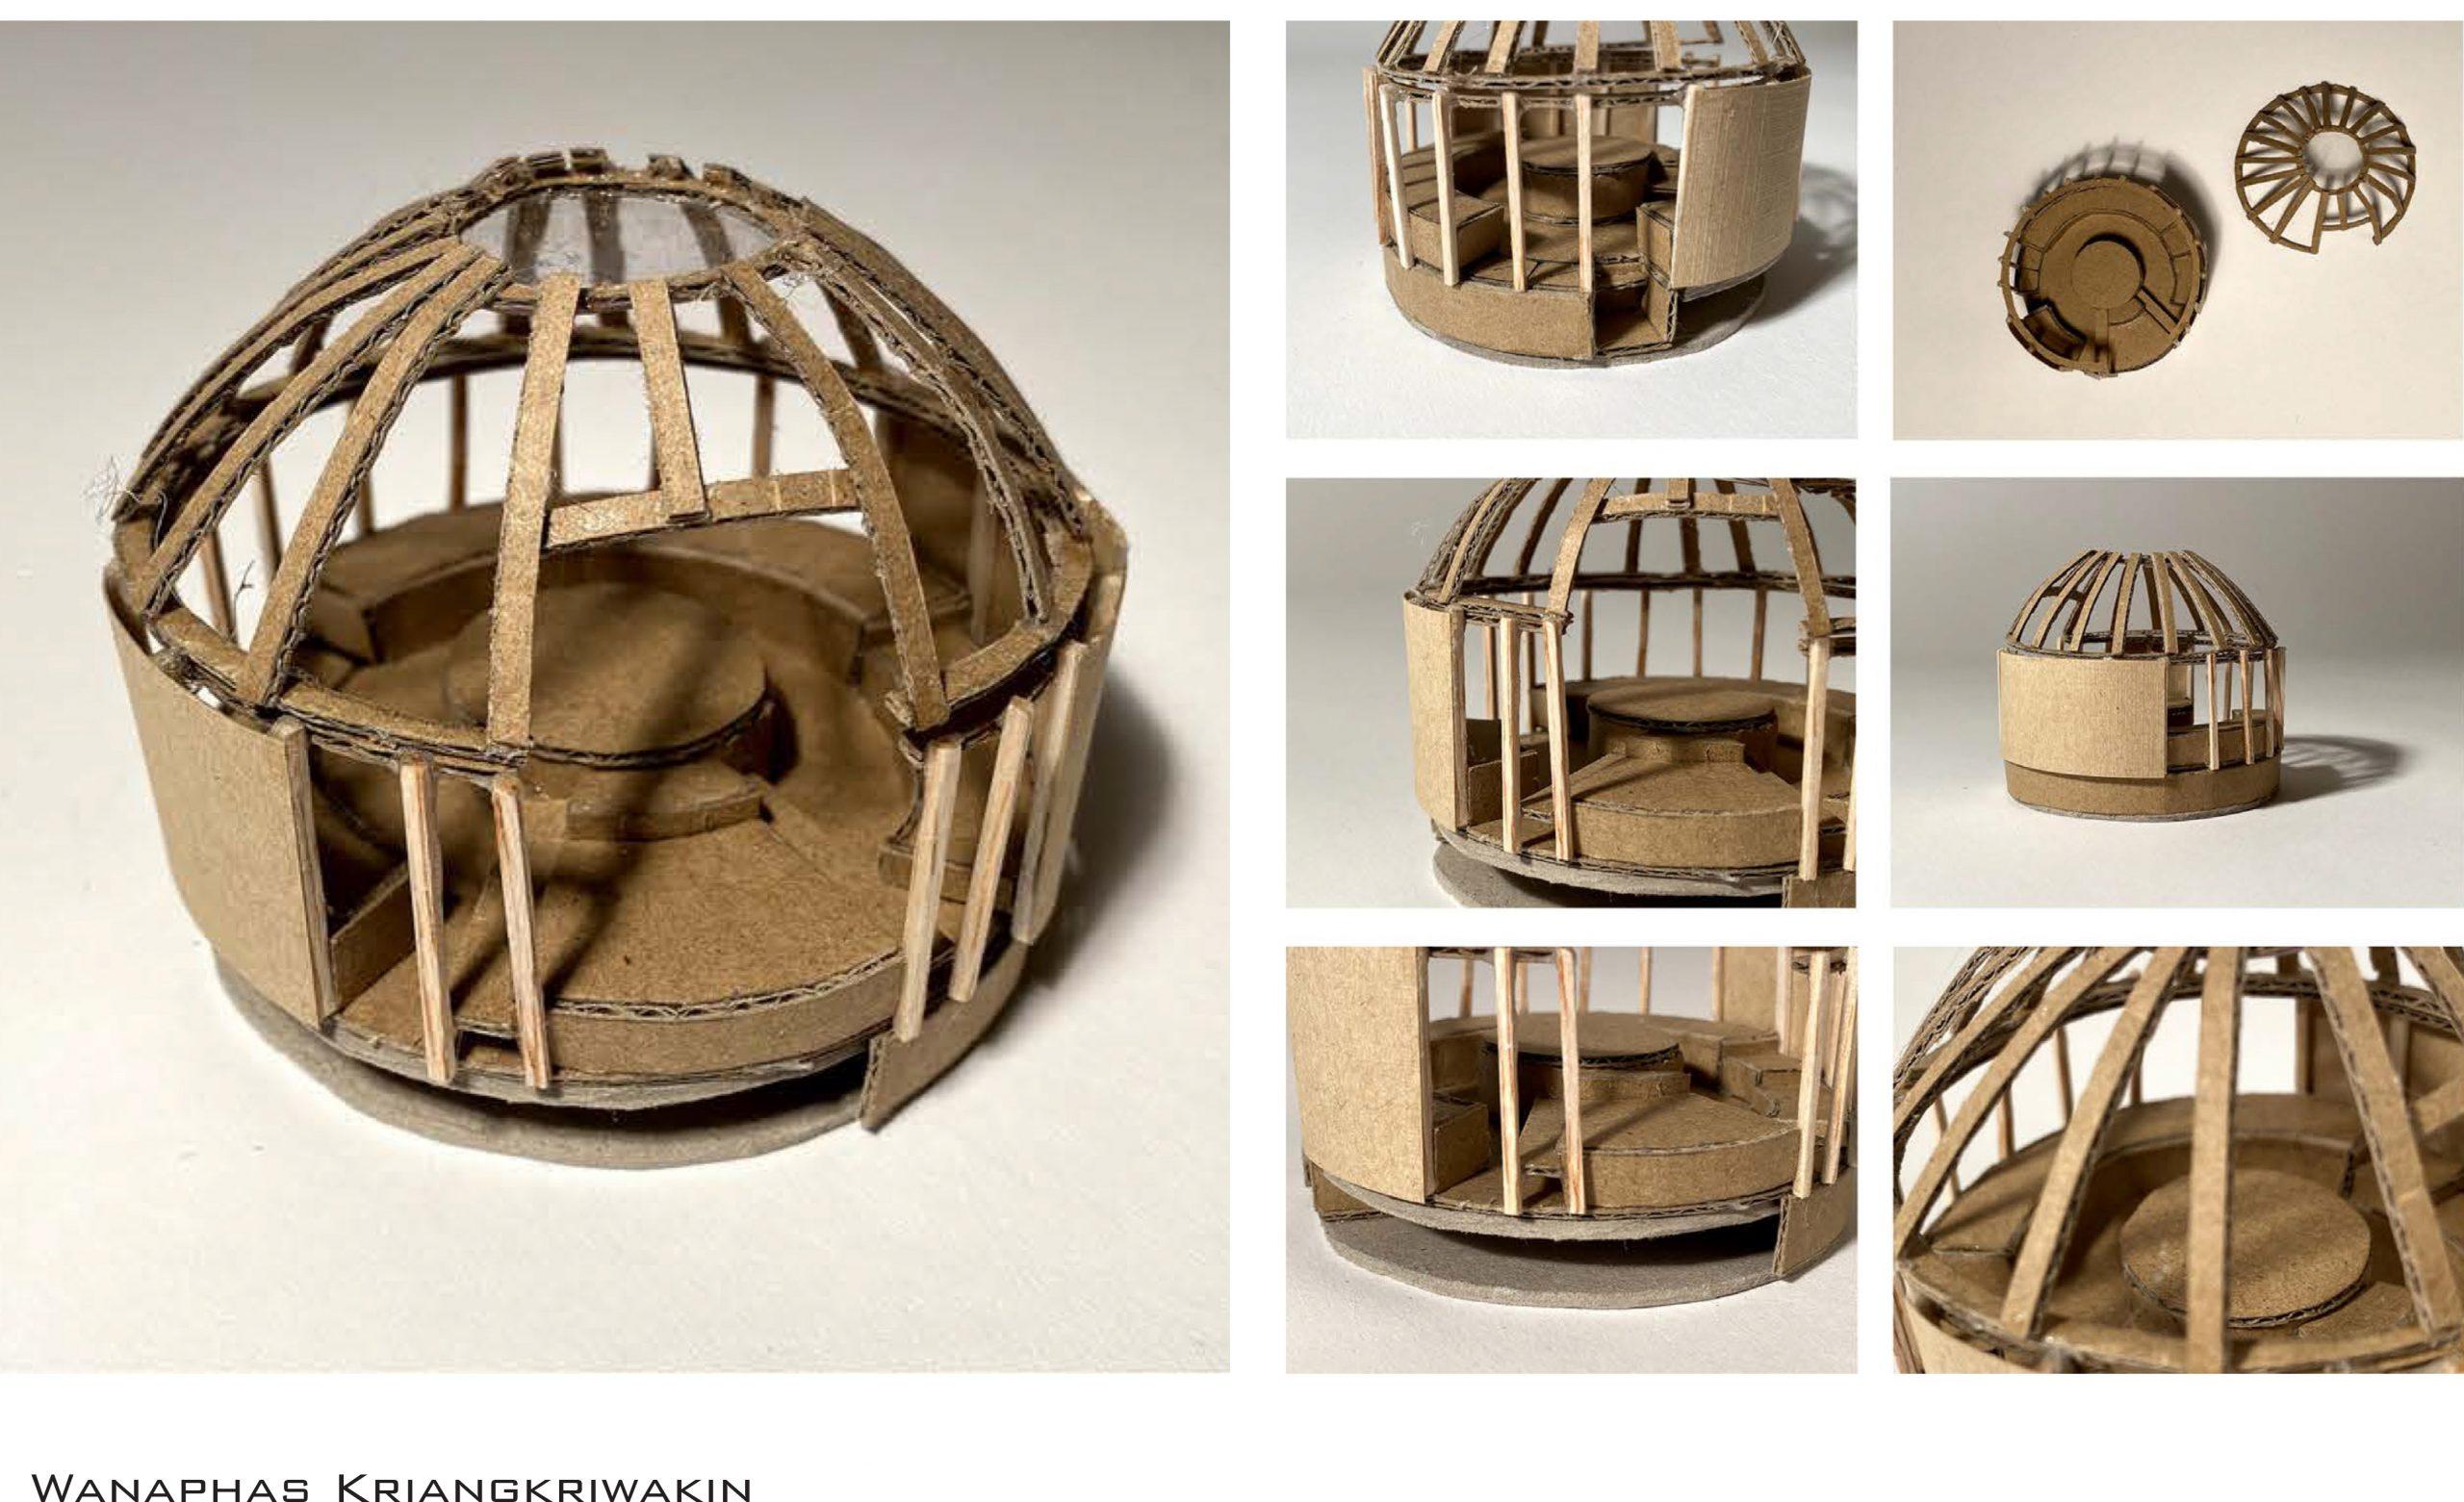 Model of musician's creative shelter